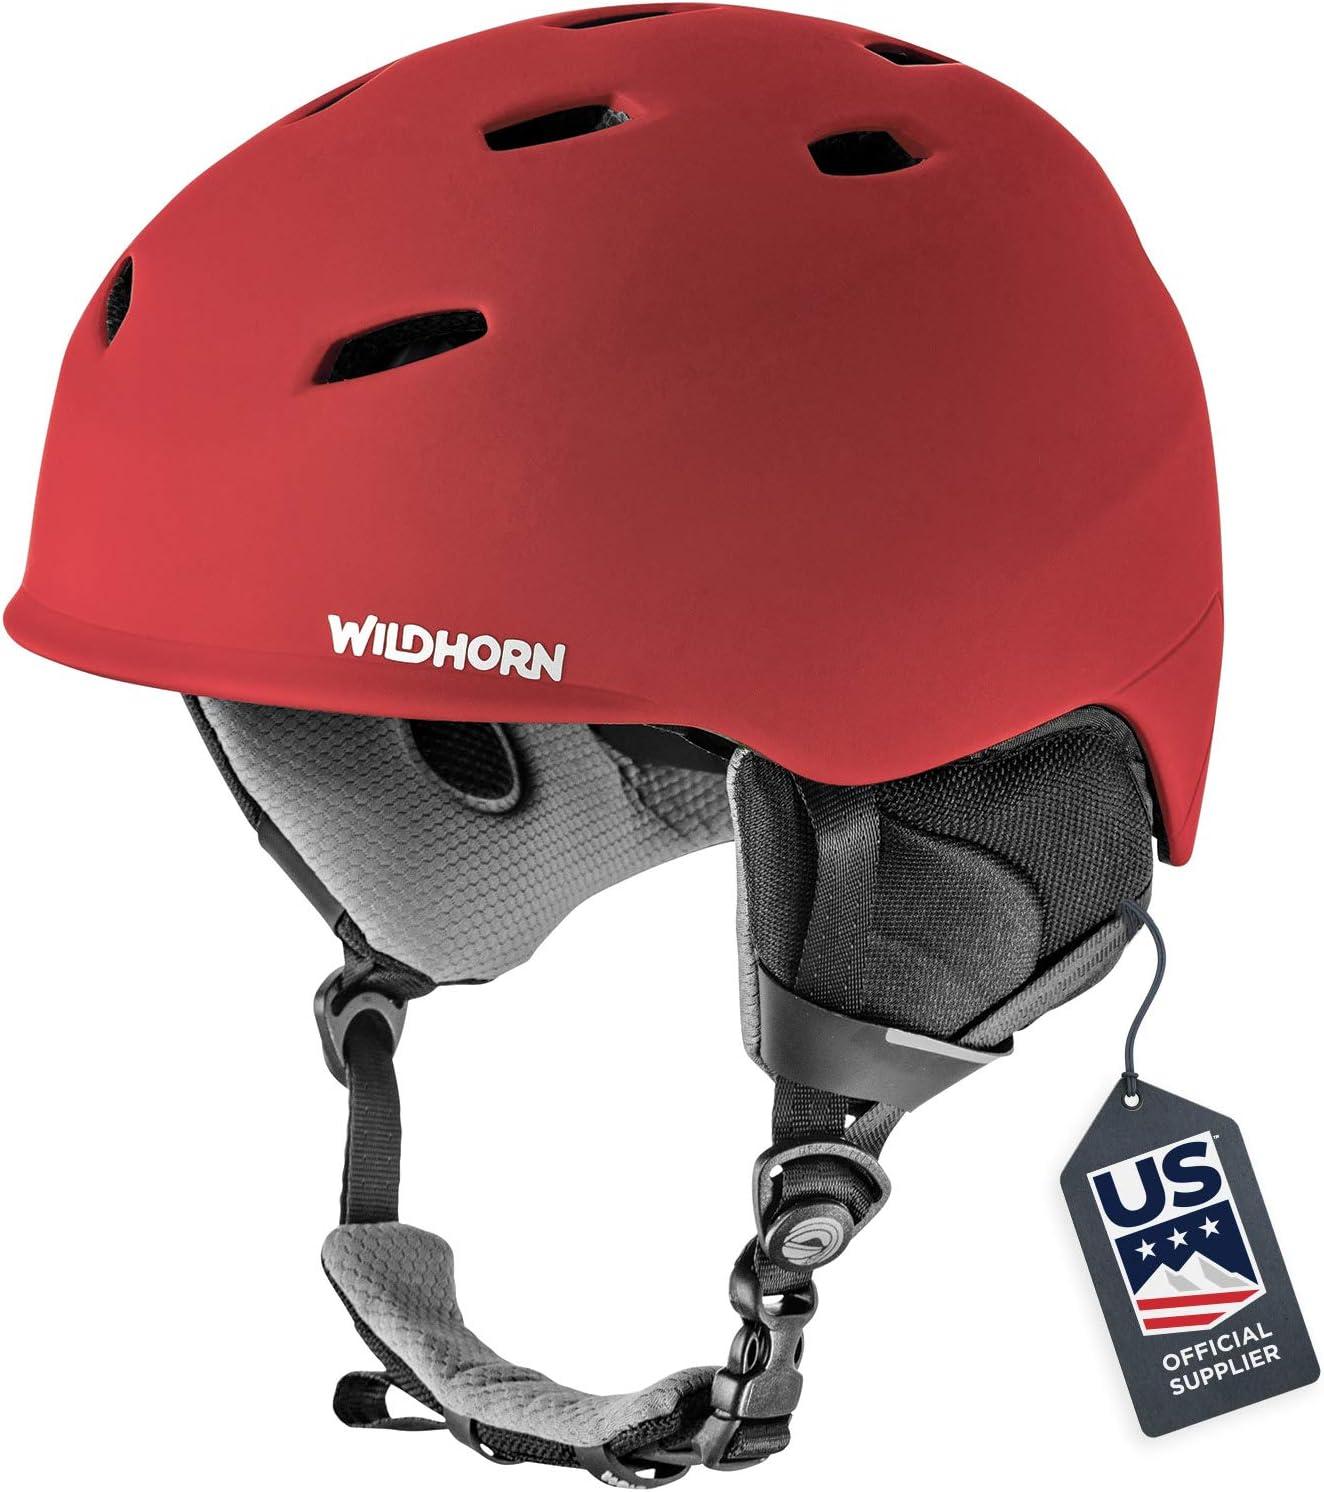 Amazon Com Wildhorn Drift Snowboard Ski Helmet Us Ski Team Official Supplier Performance Safety W Active Ventilation Sports Outdoors